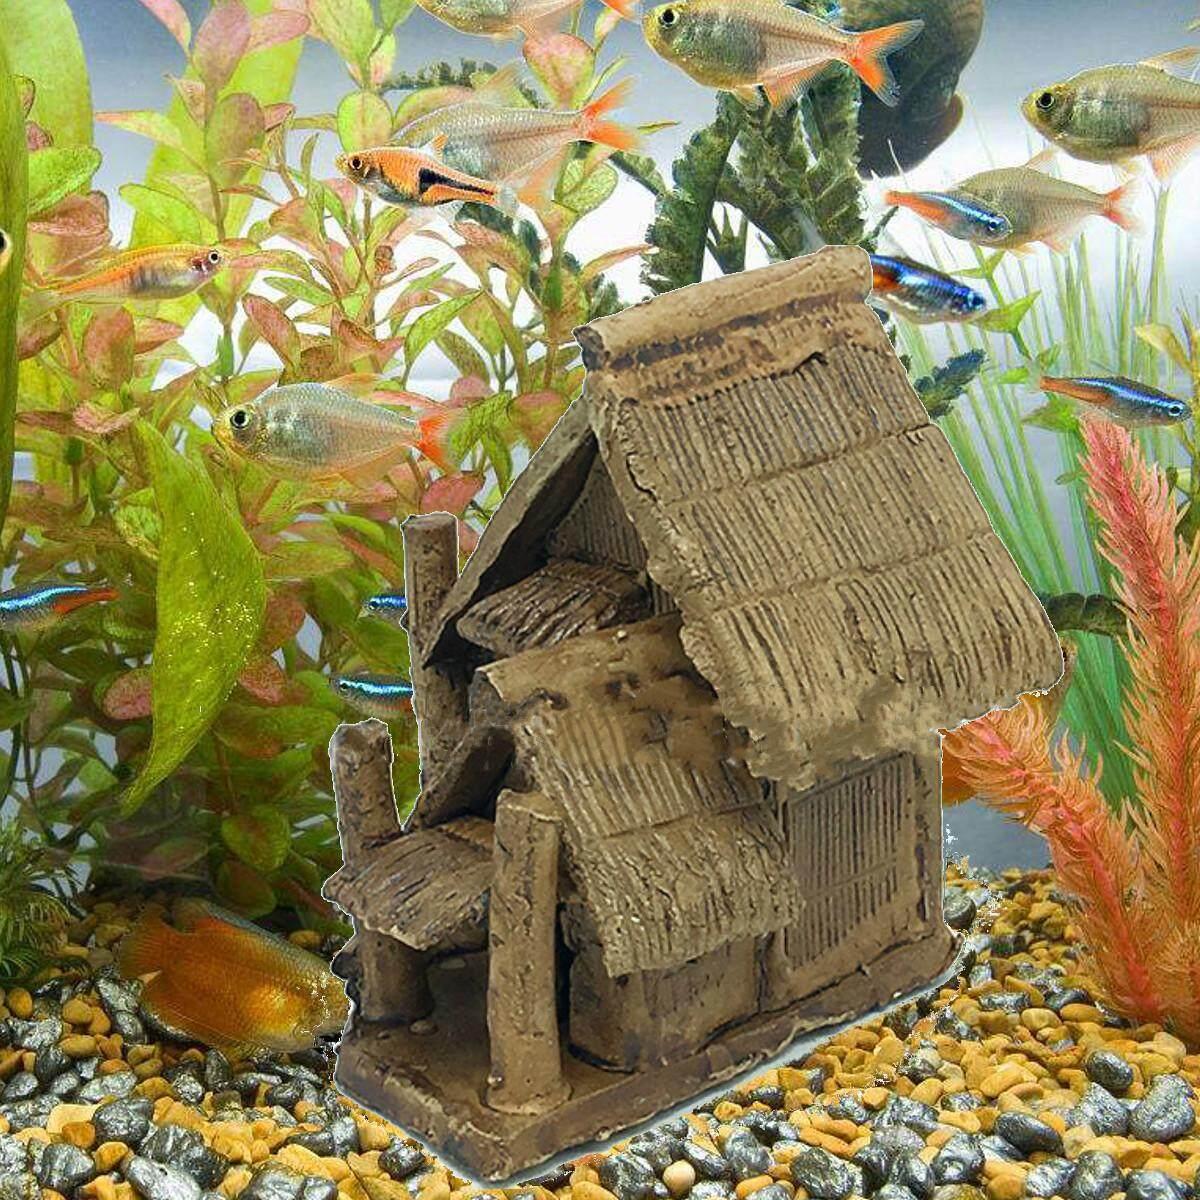 Aquarium บ้านเซรามิกเครื่องประดับตู้ปลาถ้ำซ่อน Shelter Decor ภูมิทัศน์ - INTL